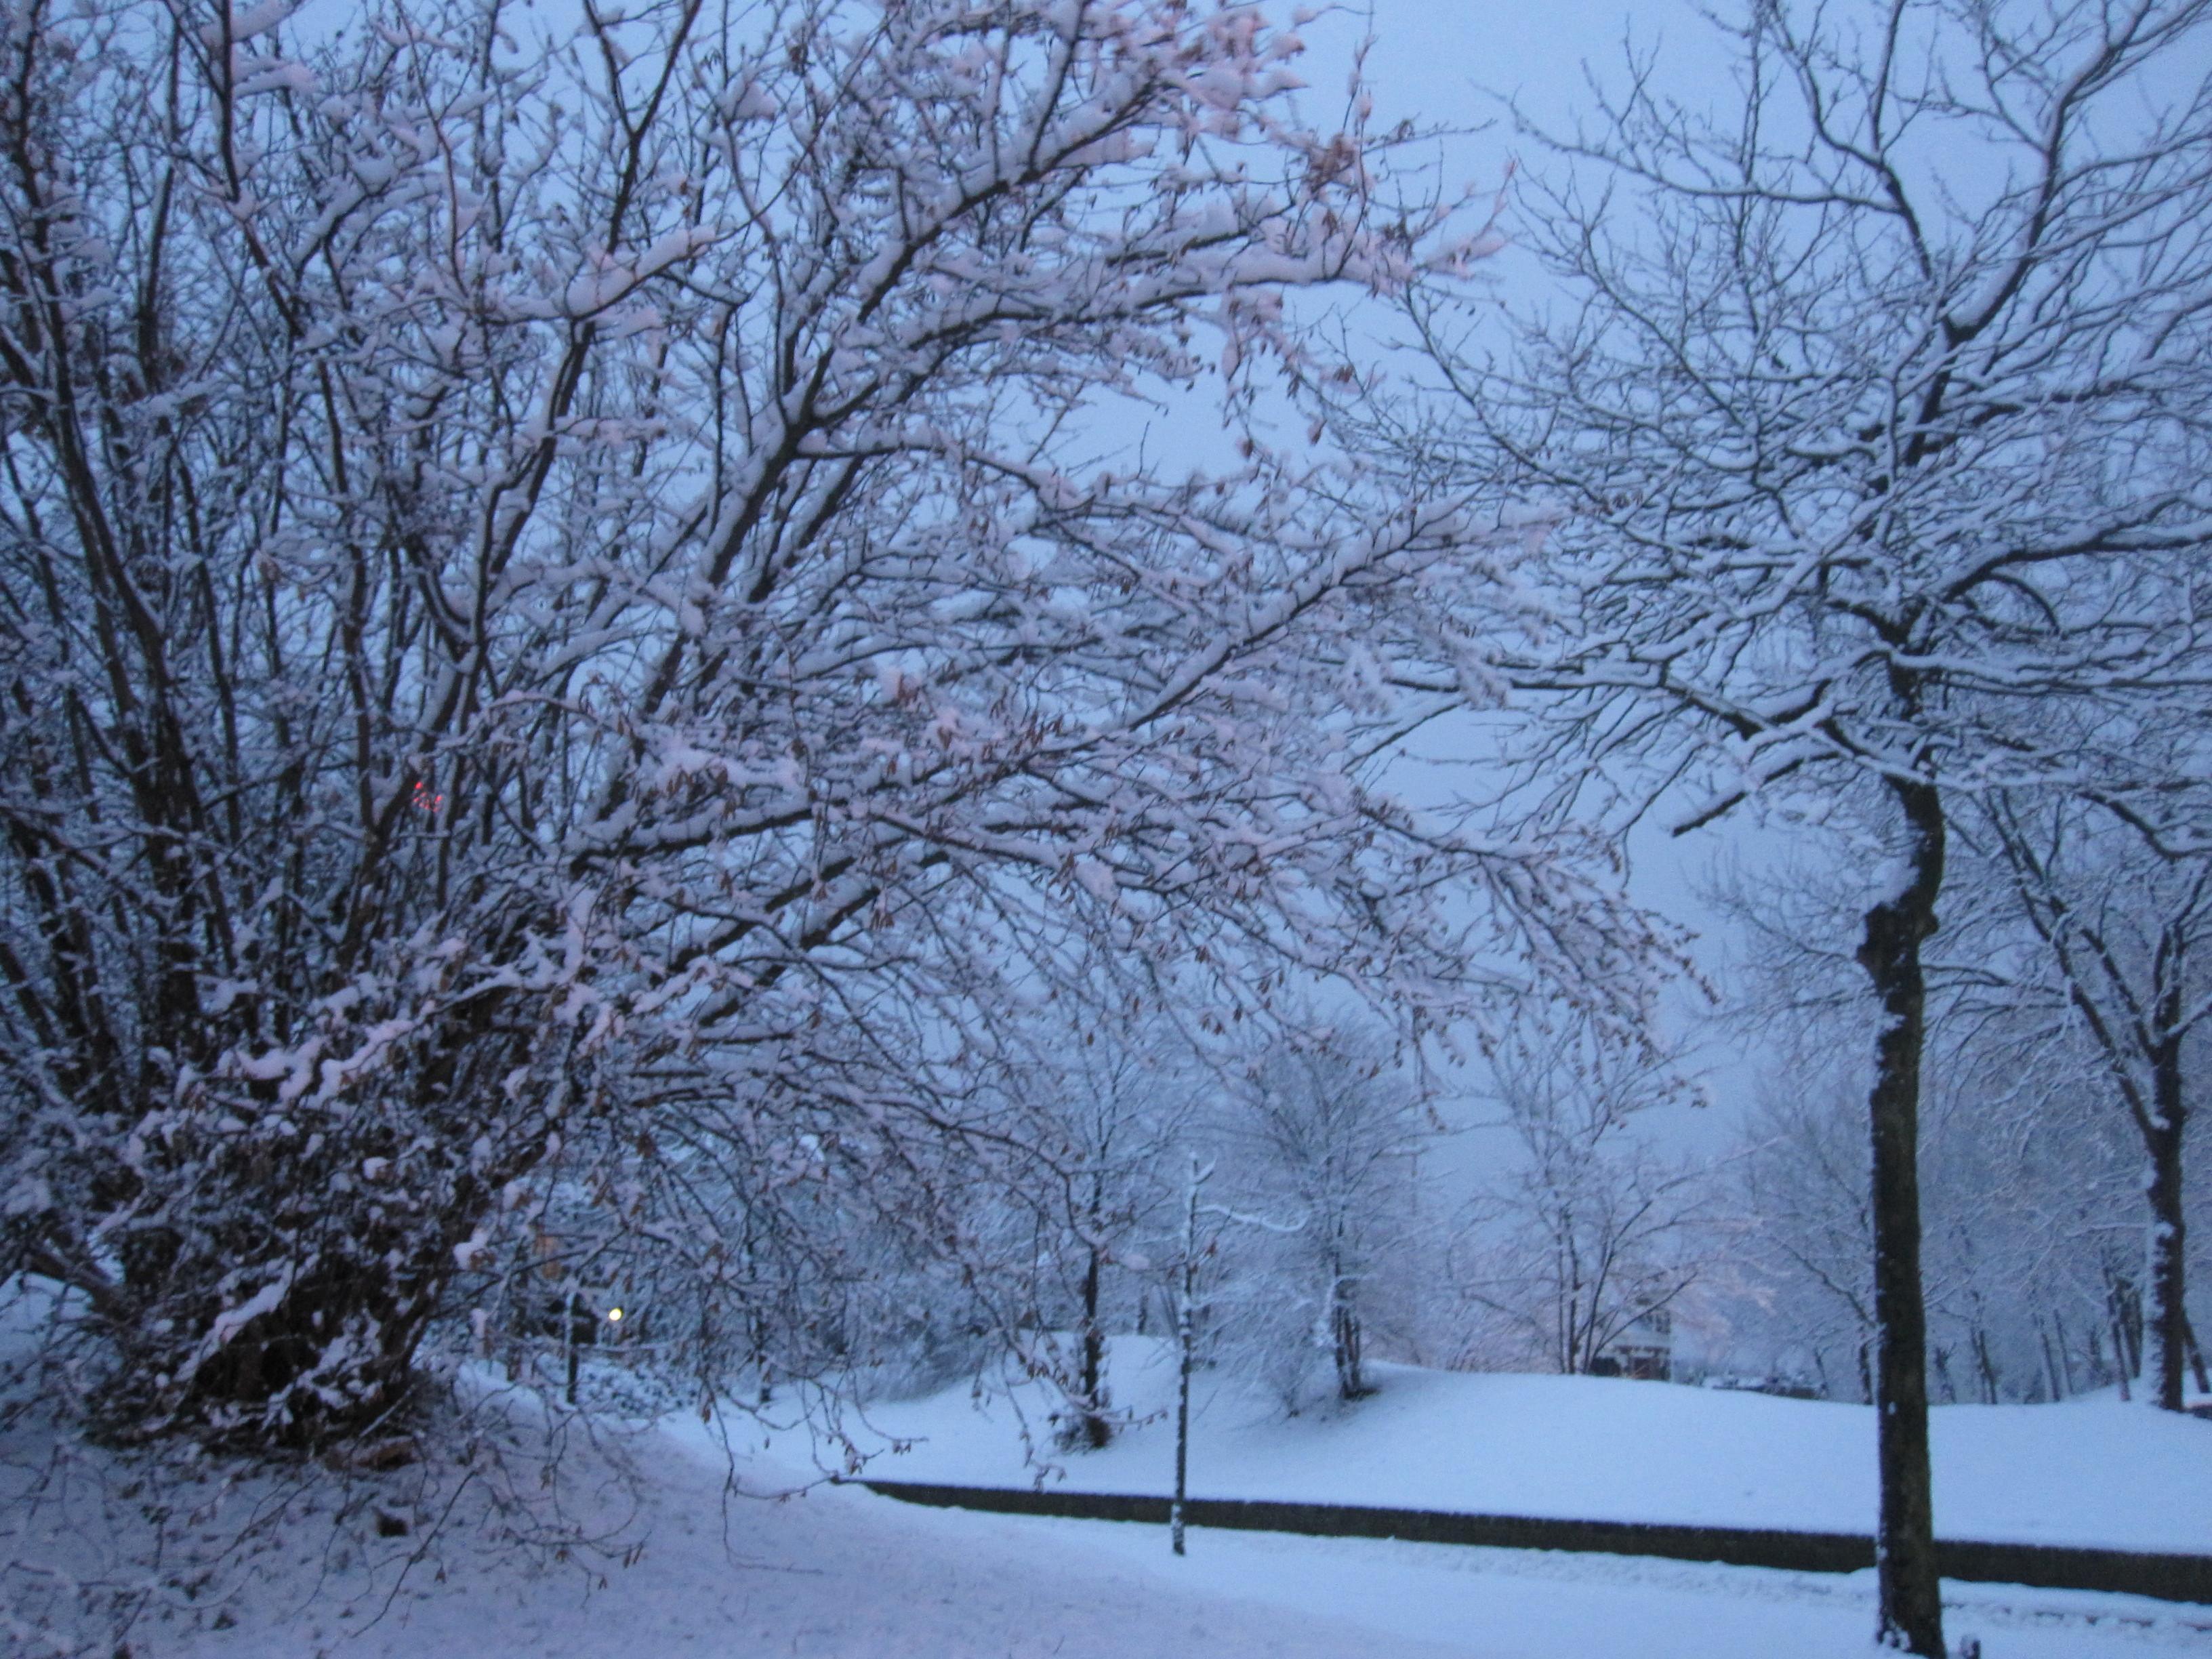 Early winter morning wallpaper 3264x2448